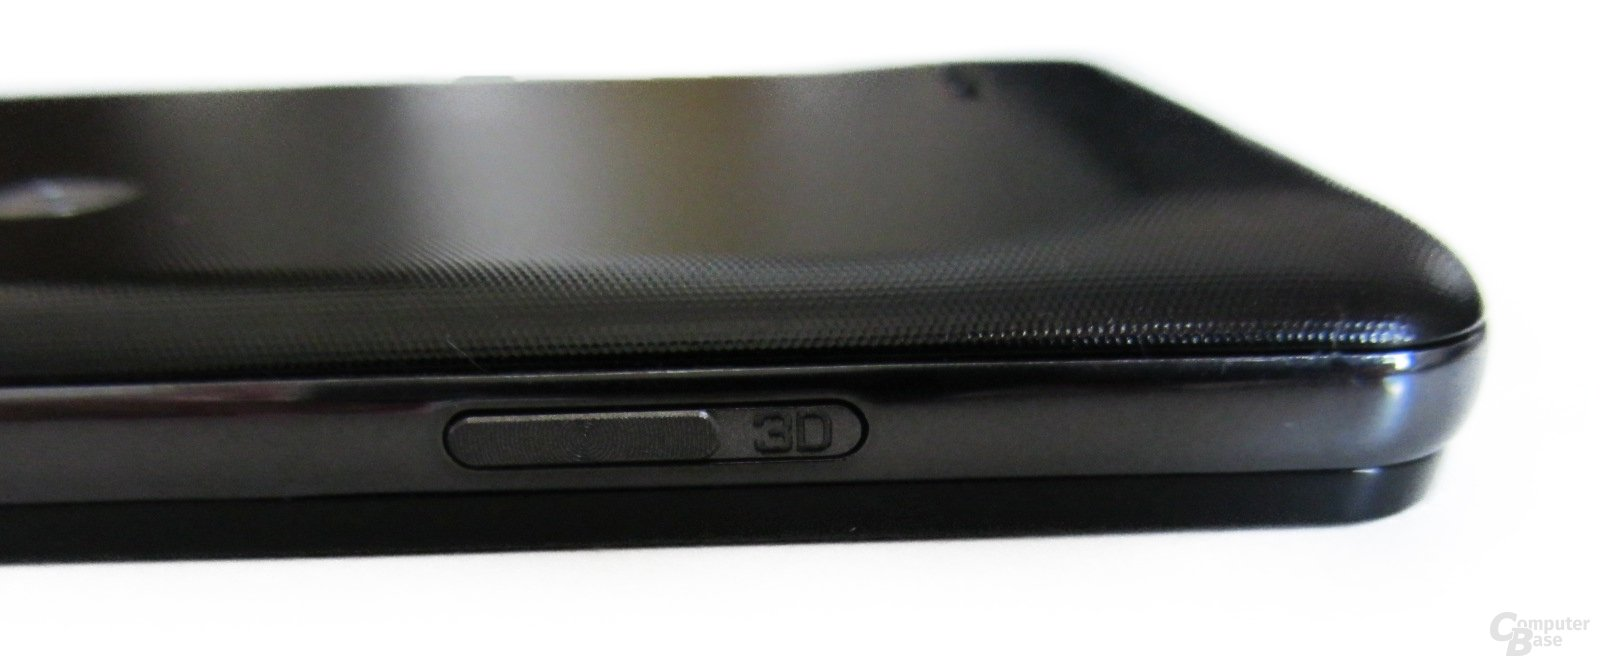 3D-Knopf des LG Optimus 3D Max